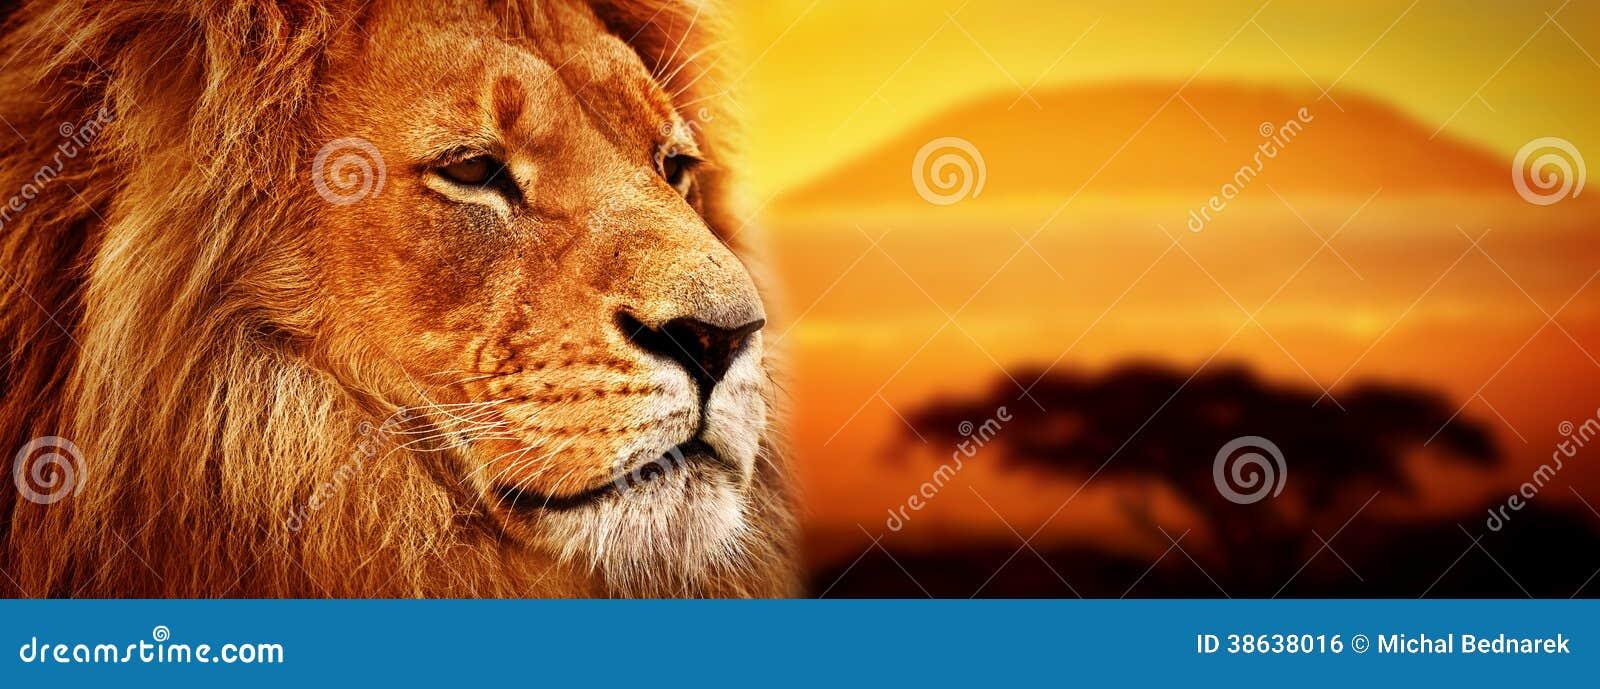 Lion portrait on savanna. Mount Kilimanjaro